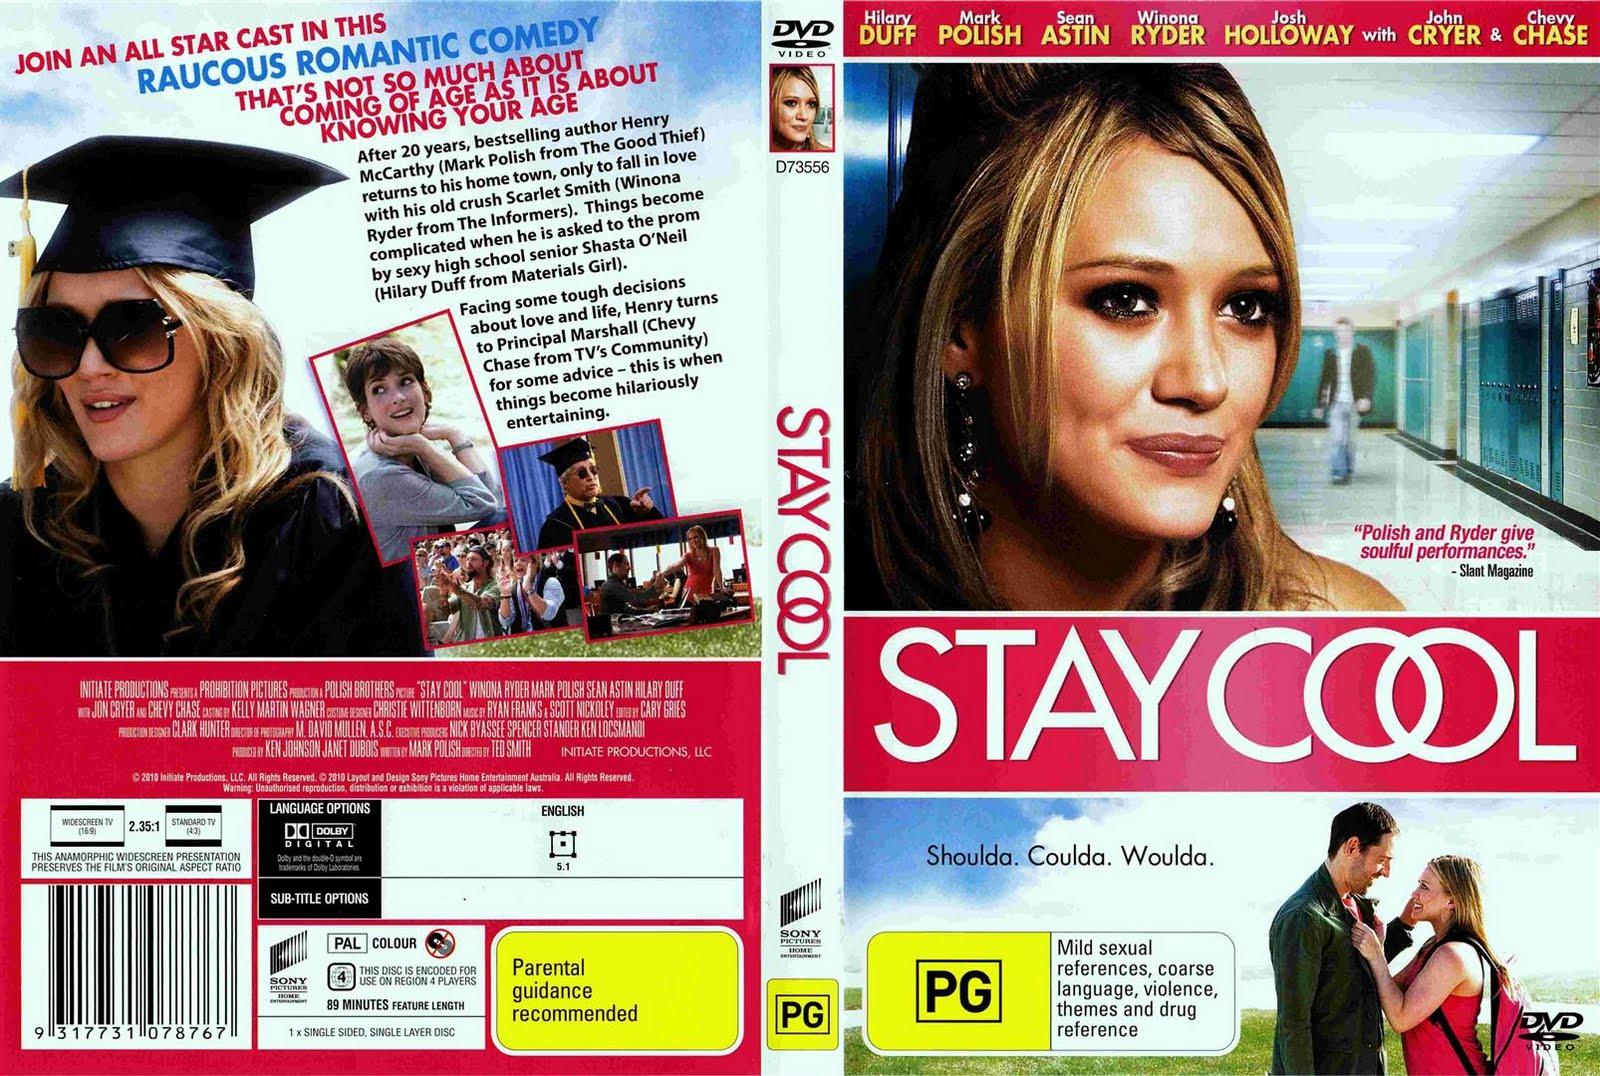 http://1.bp.blogspot.com/-iq0il8vf8TE/TV2FVaaj1II/AAAAAAAAAMw/ZlMoVWzX1H0/s1600/Stay_Cool.jpg